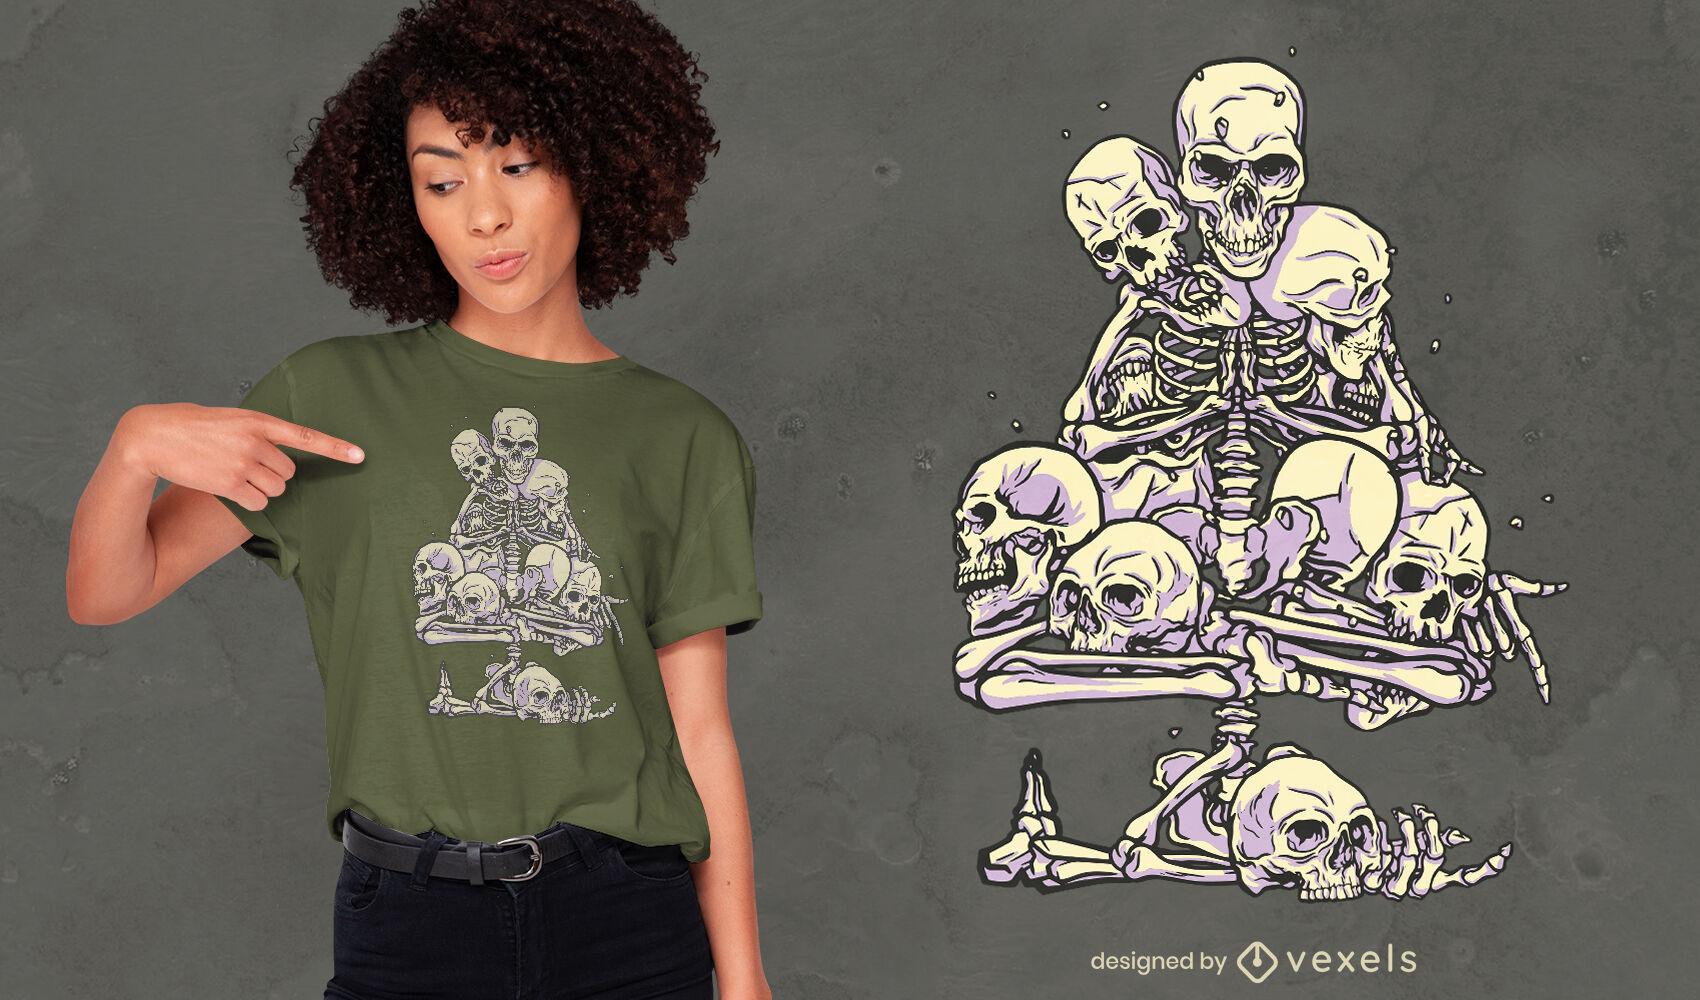 Dise?o de camiseta de esqueleto y calaveras.